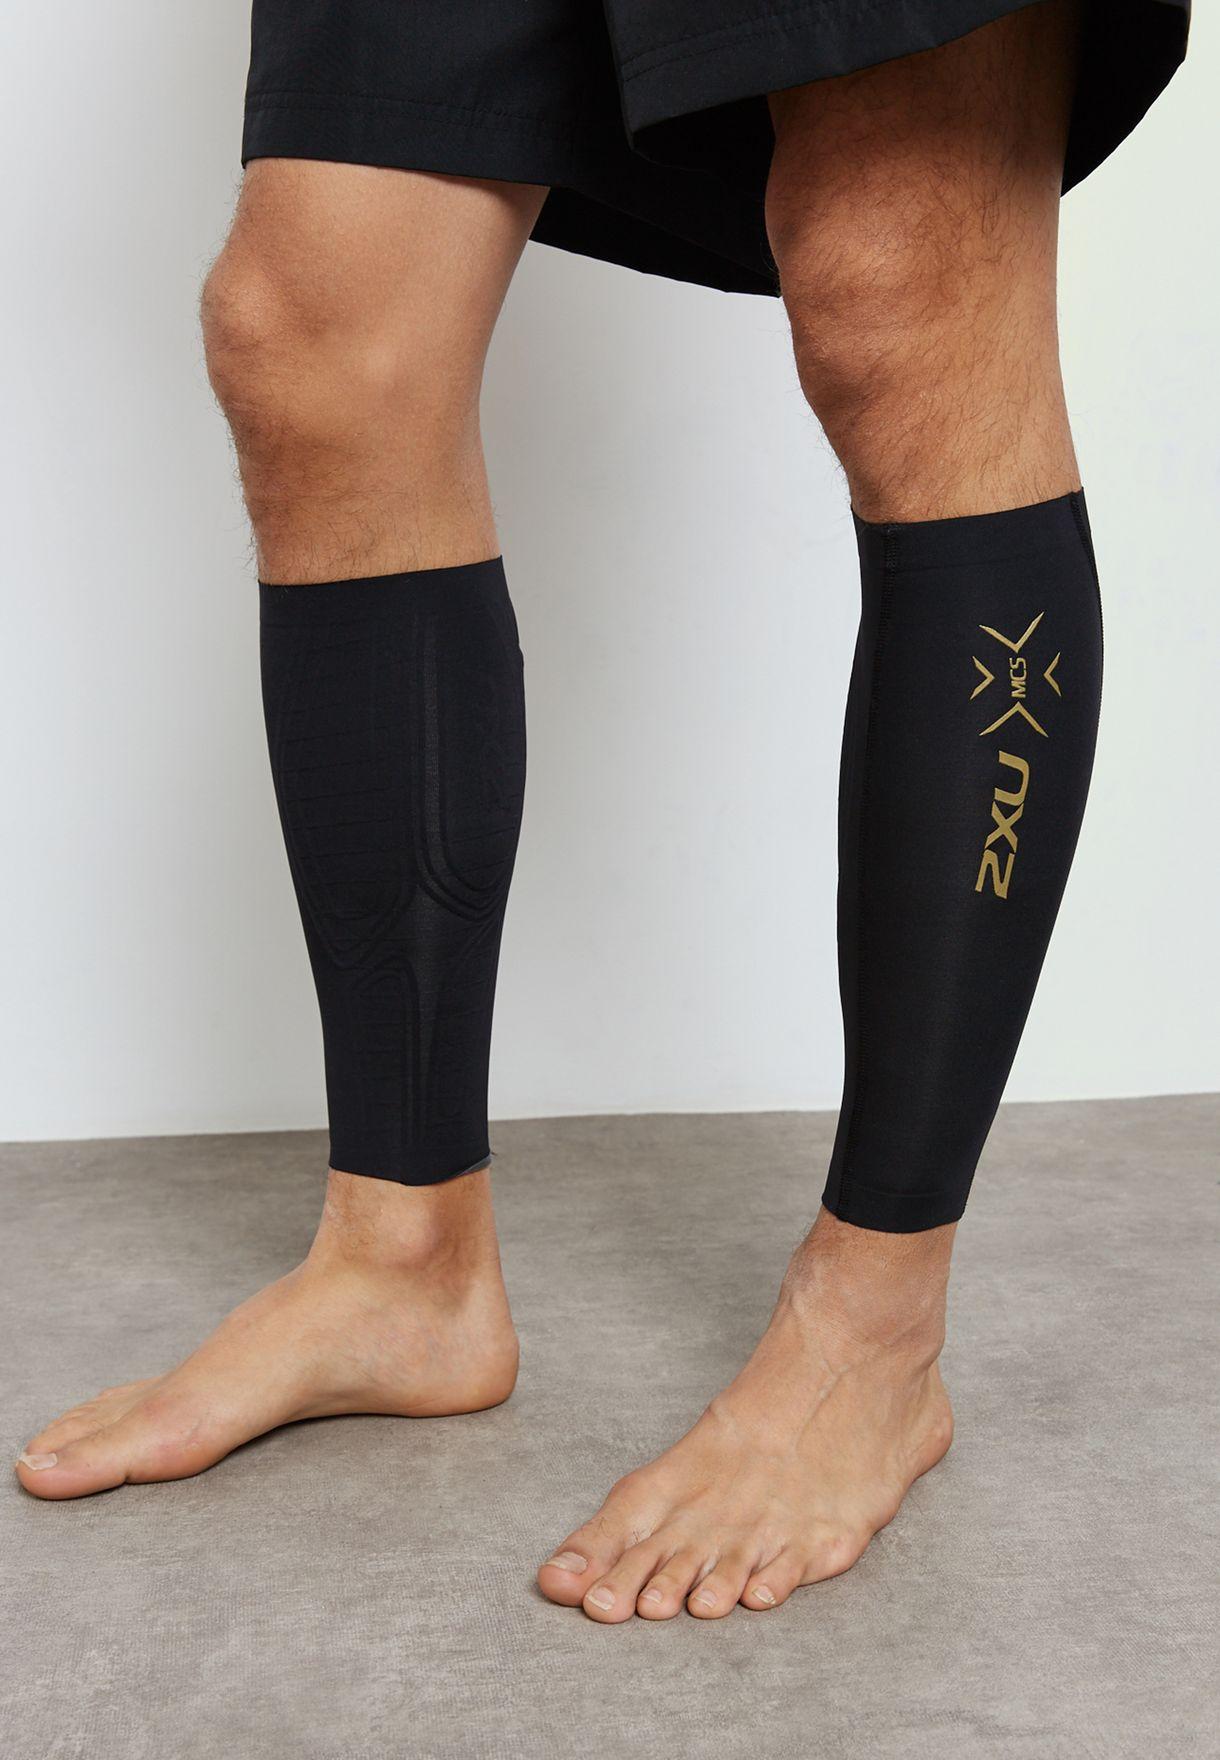 Buy 2xu Black Mcs Compression Calf Guards for Men in Mena, Worldwide,  Globally | 2X259AC44ZQX